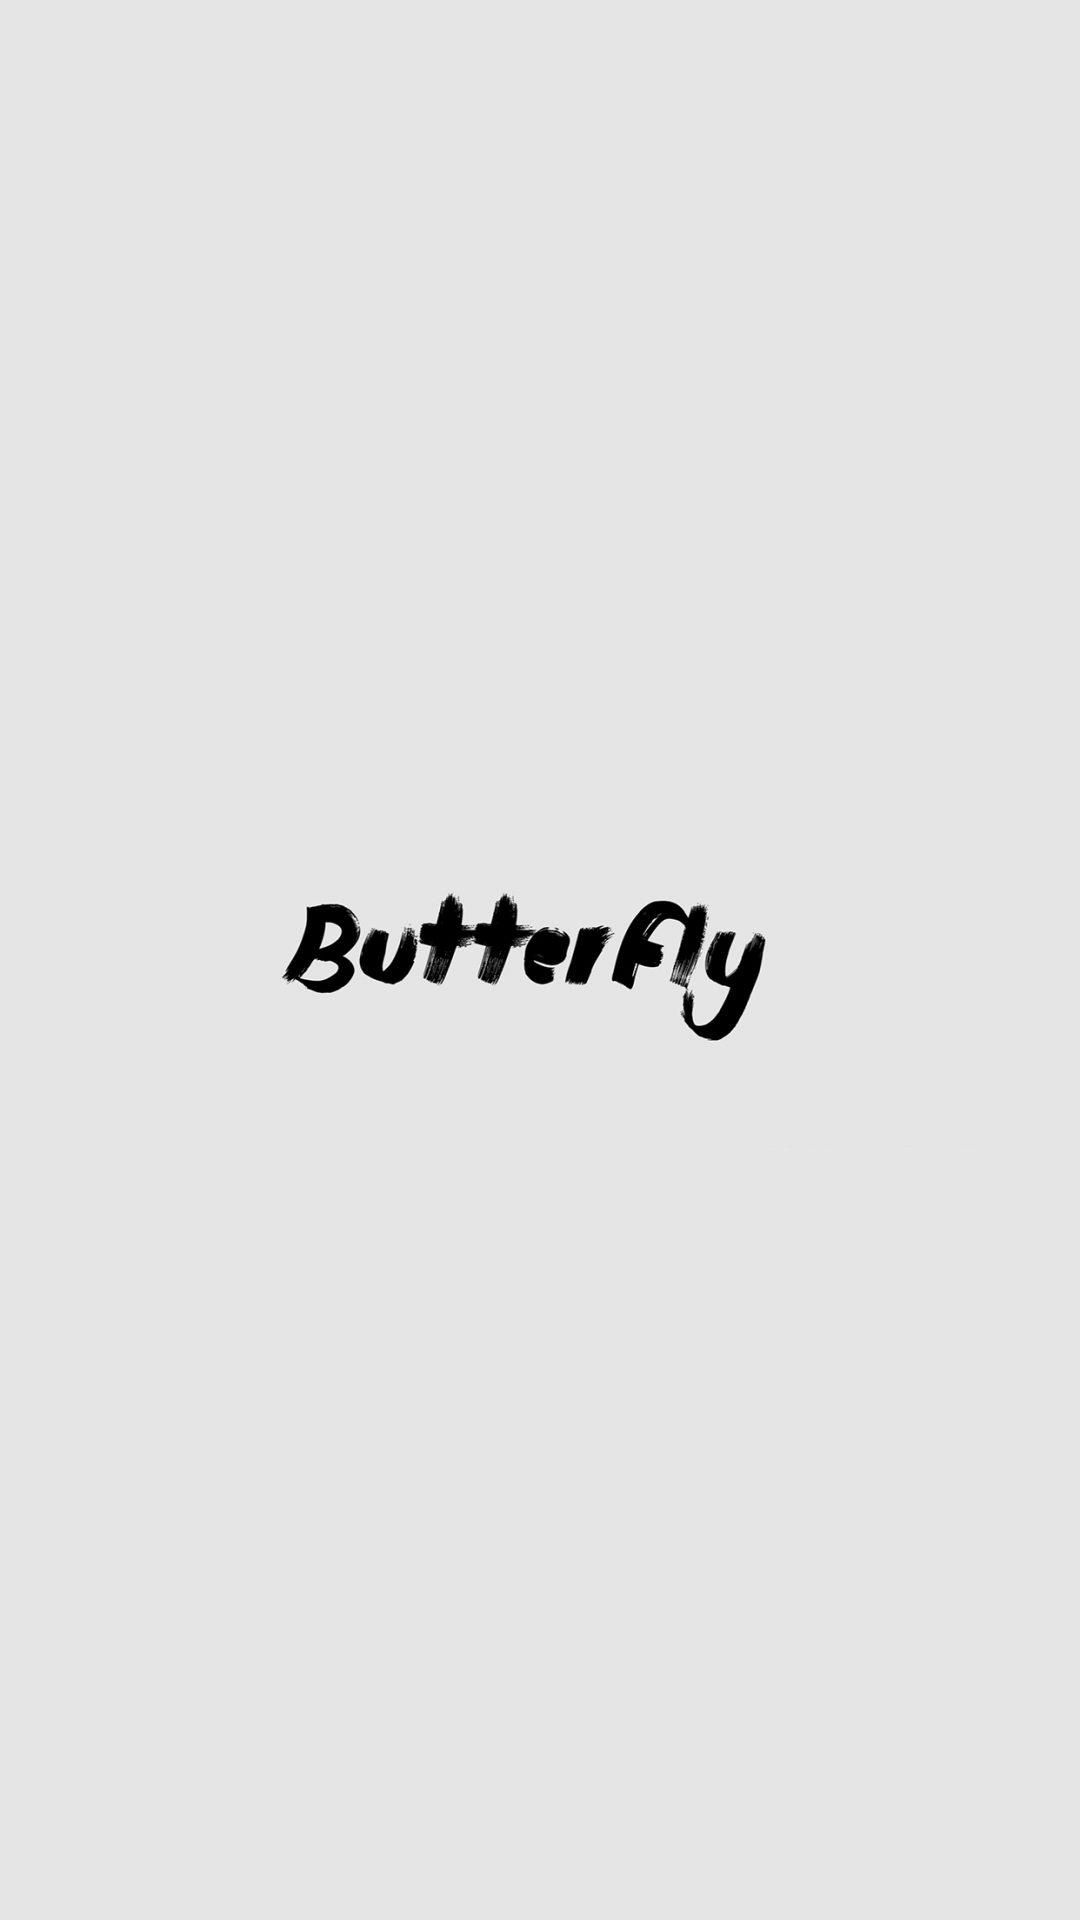 Christina Perri Logo Butterfly Music White